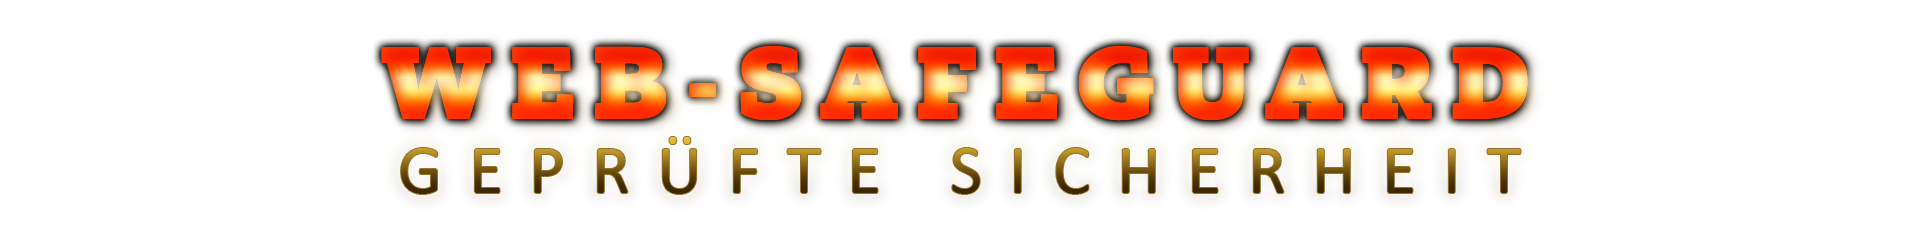 Web-Saveguard